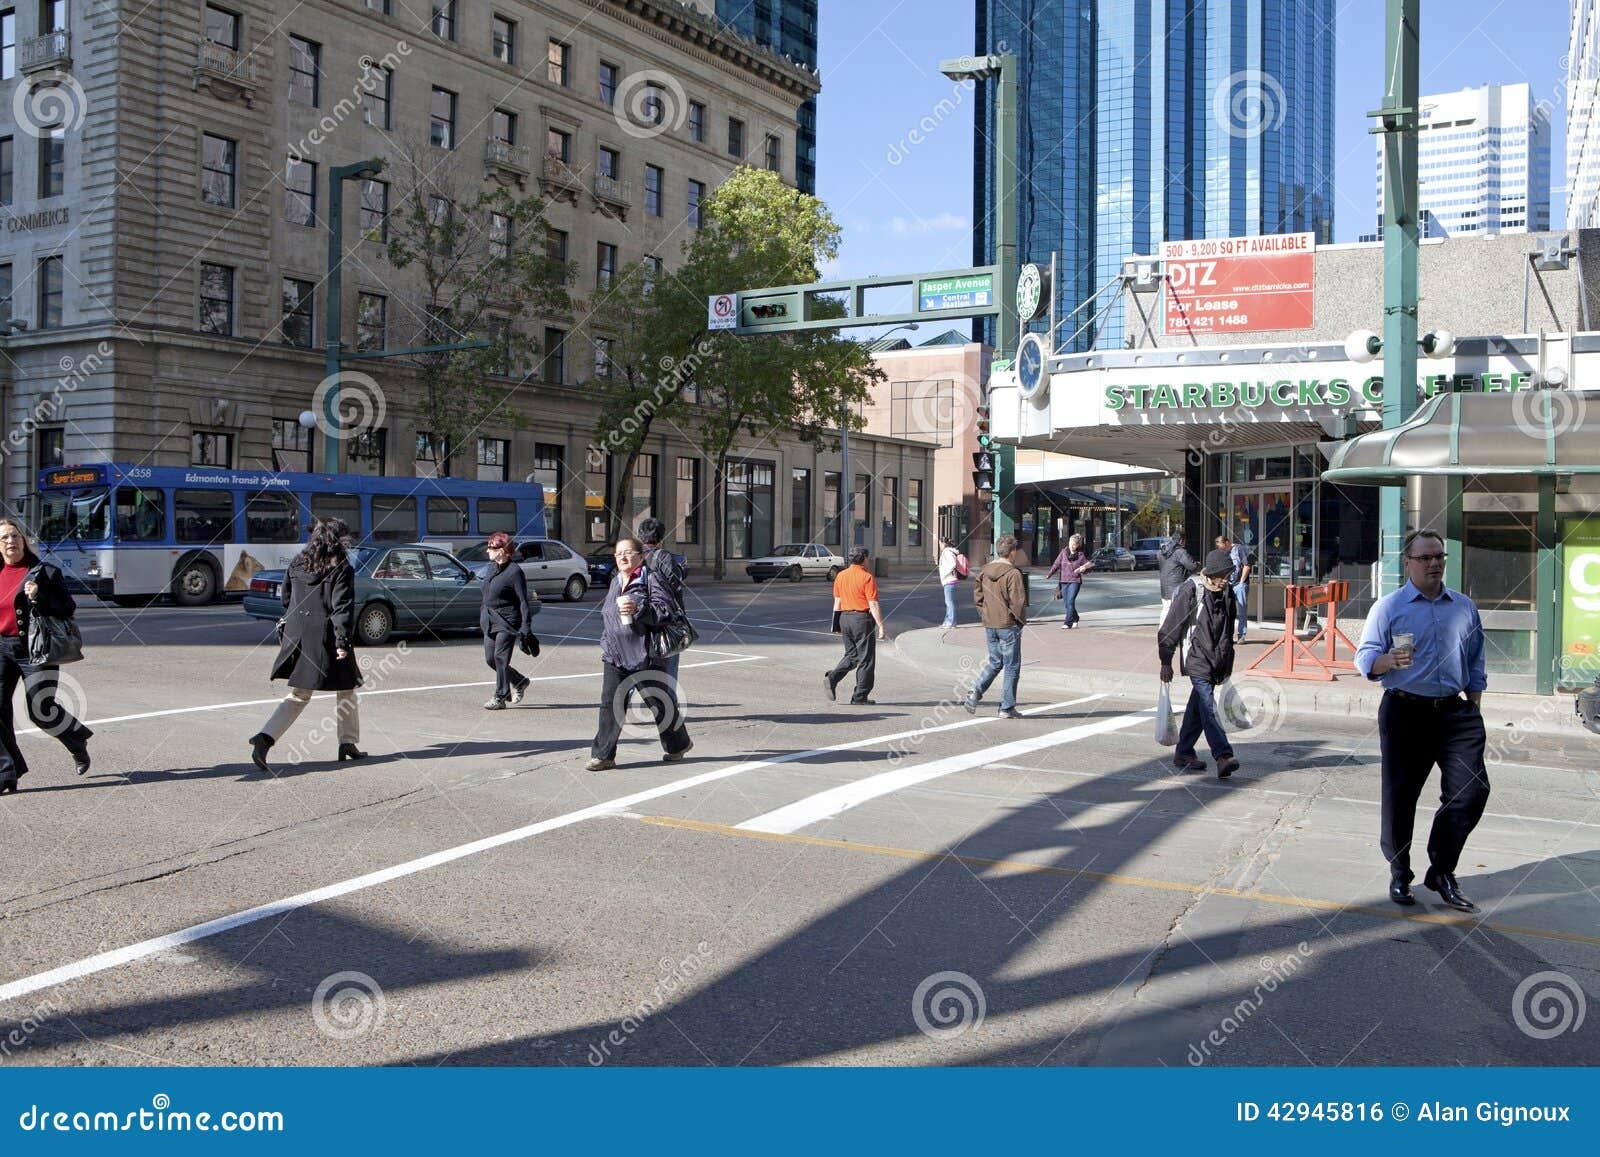 A street scene, Edmonton, Canada